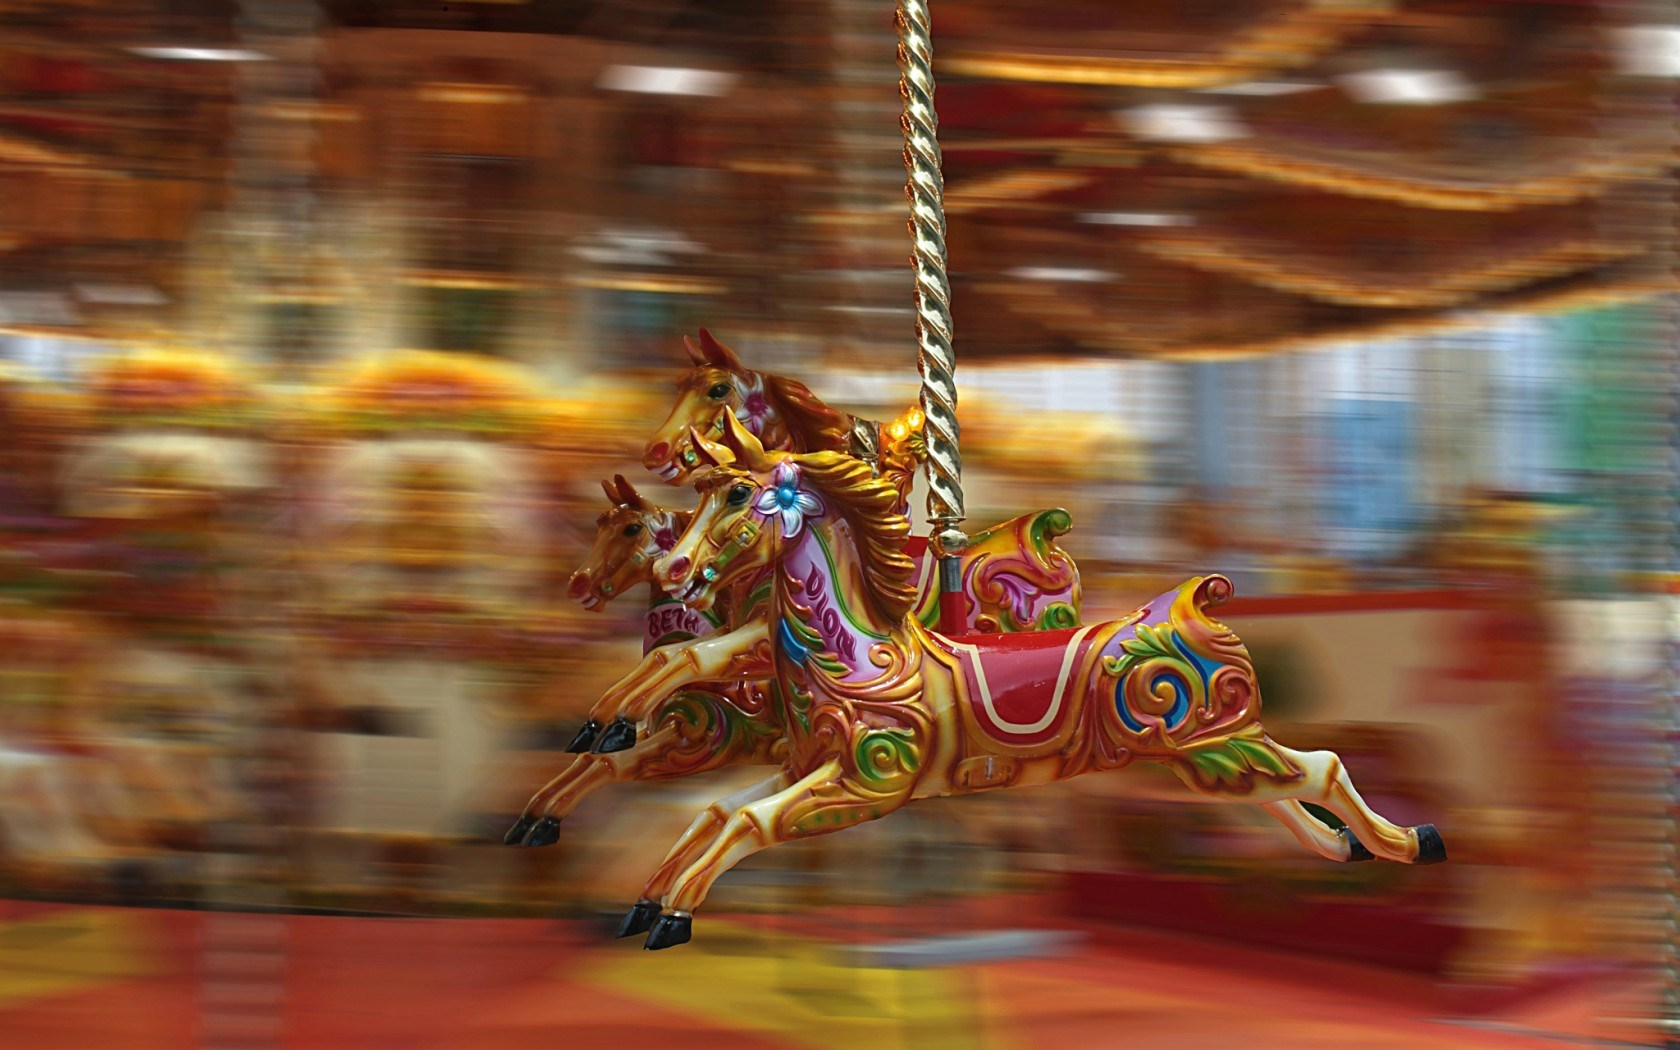 horses-ride-carousel-mood-hd-wallpaper